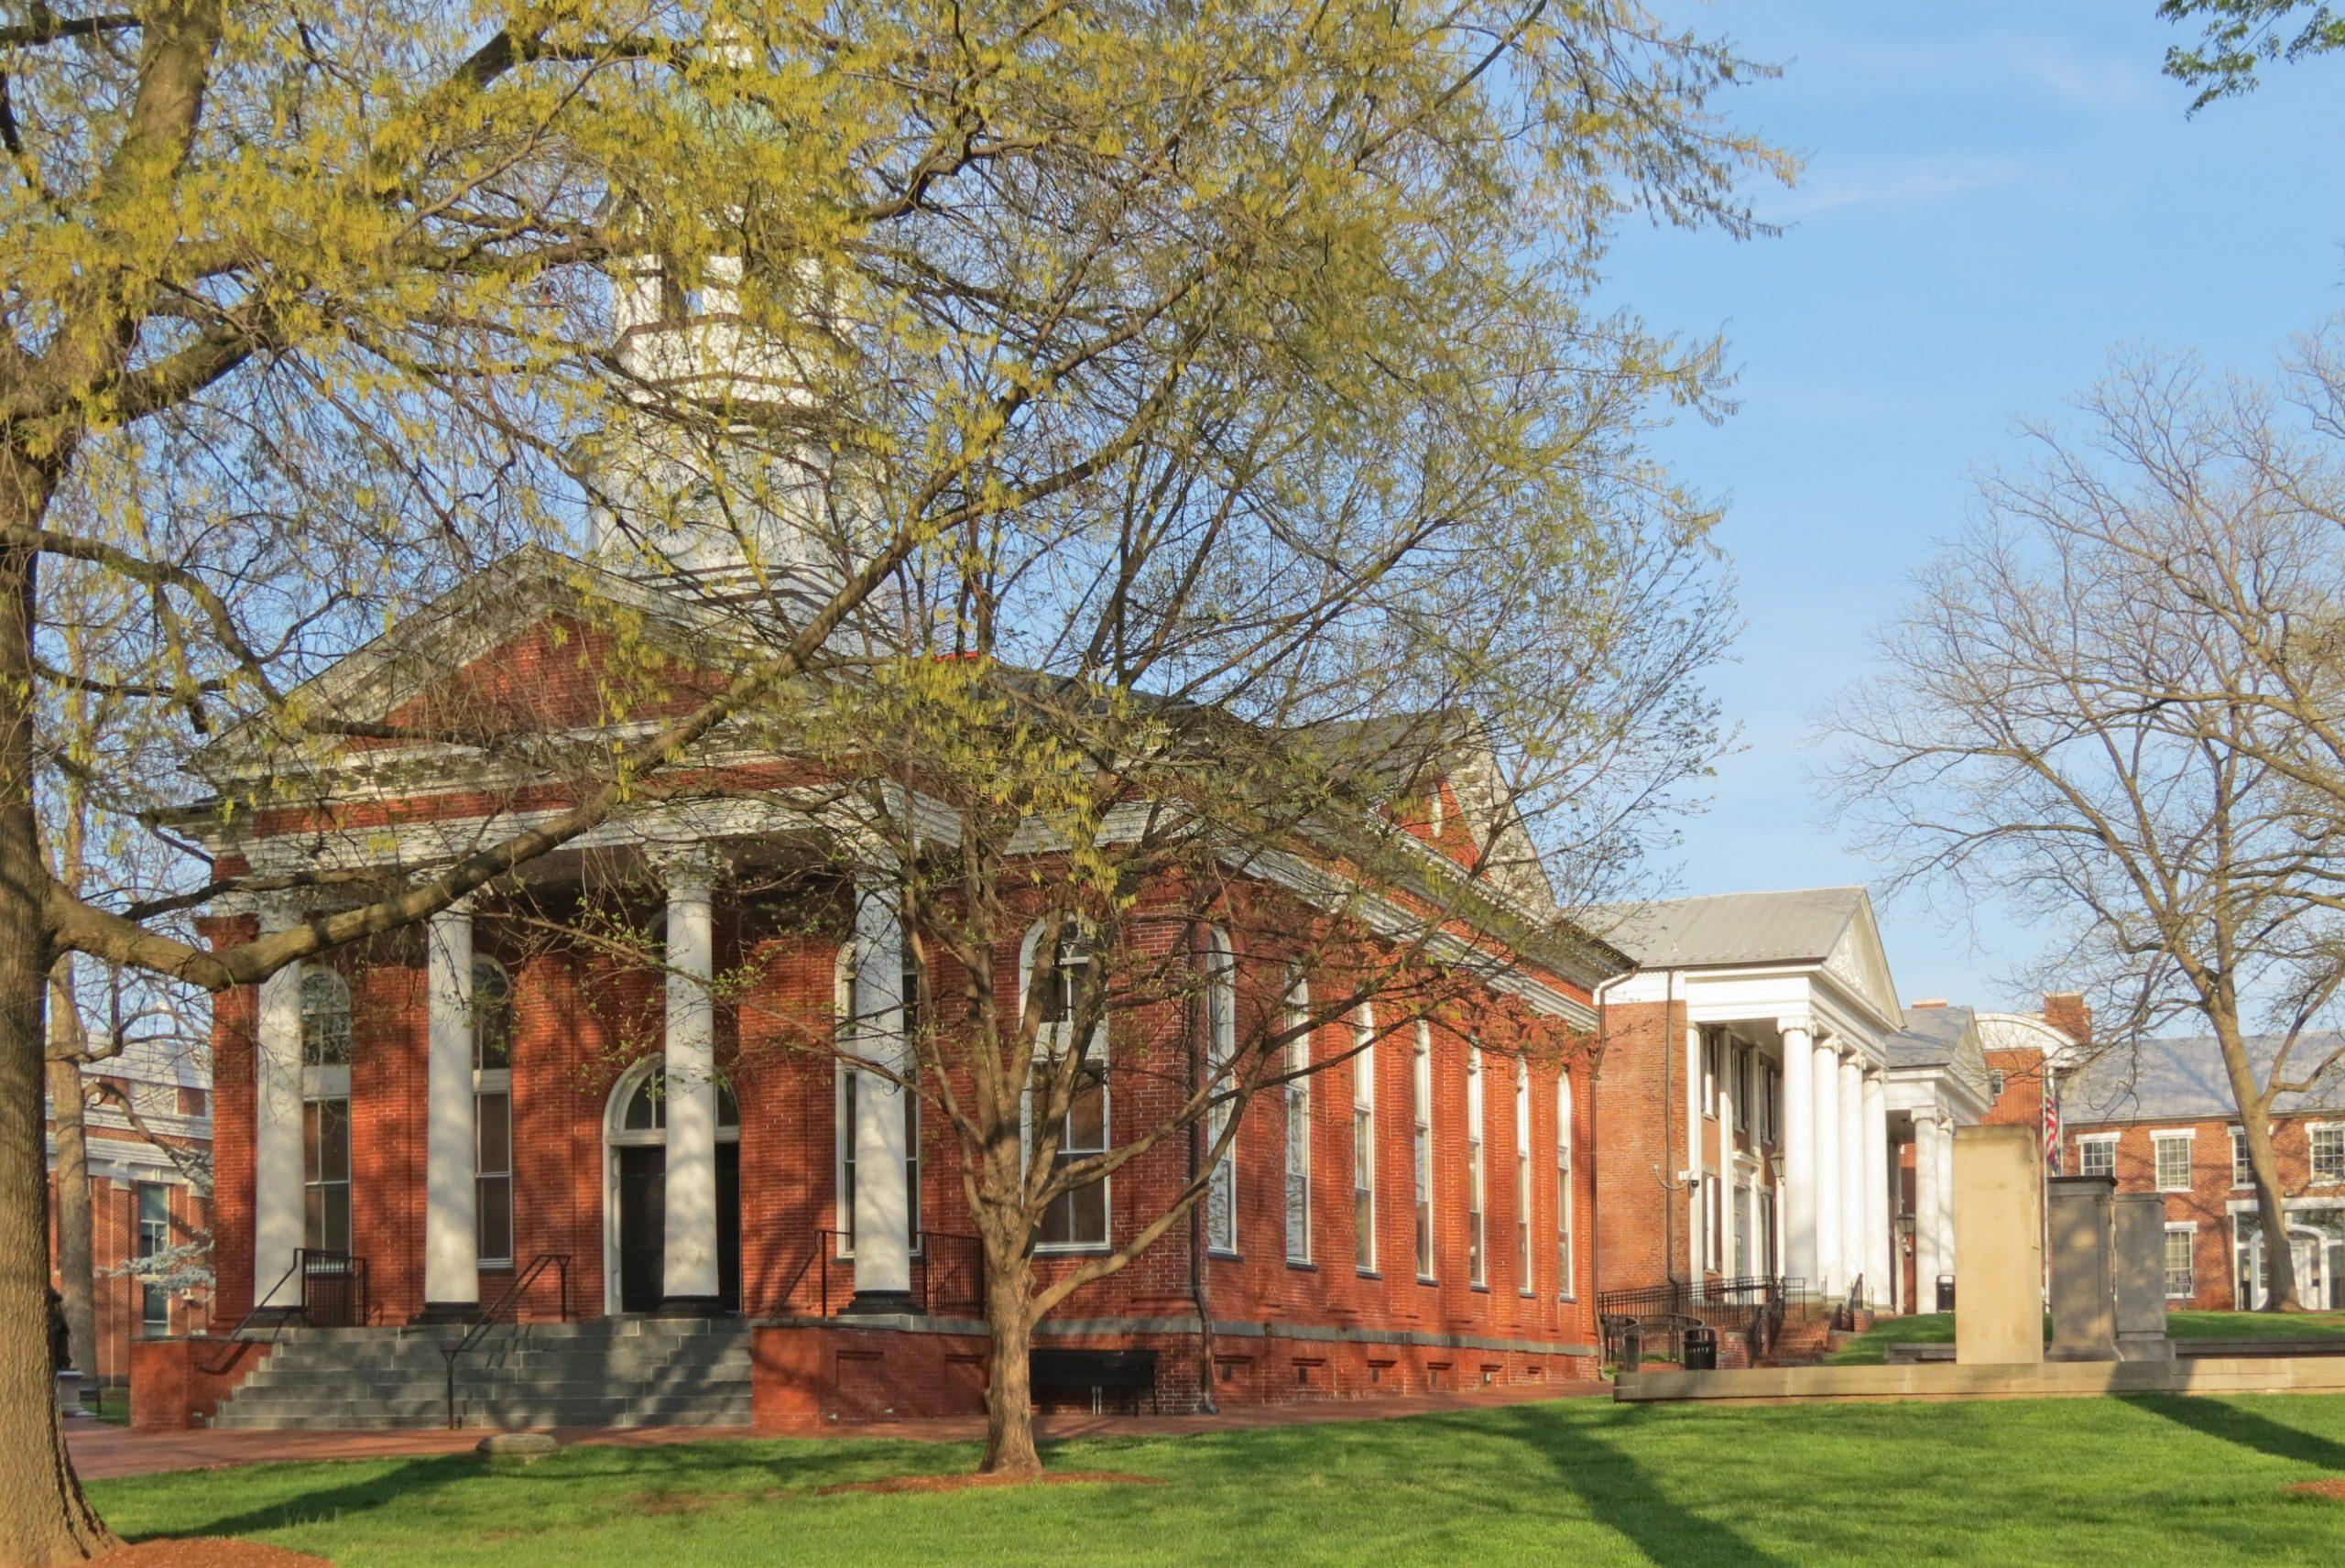 Leesburg Historic District